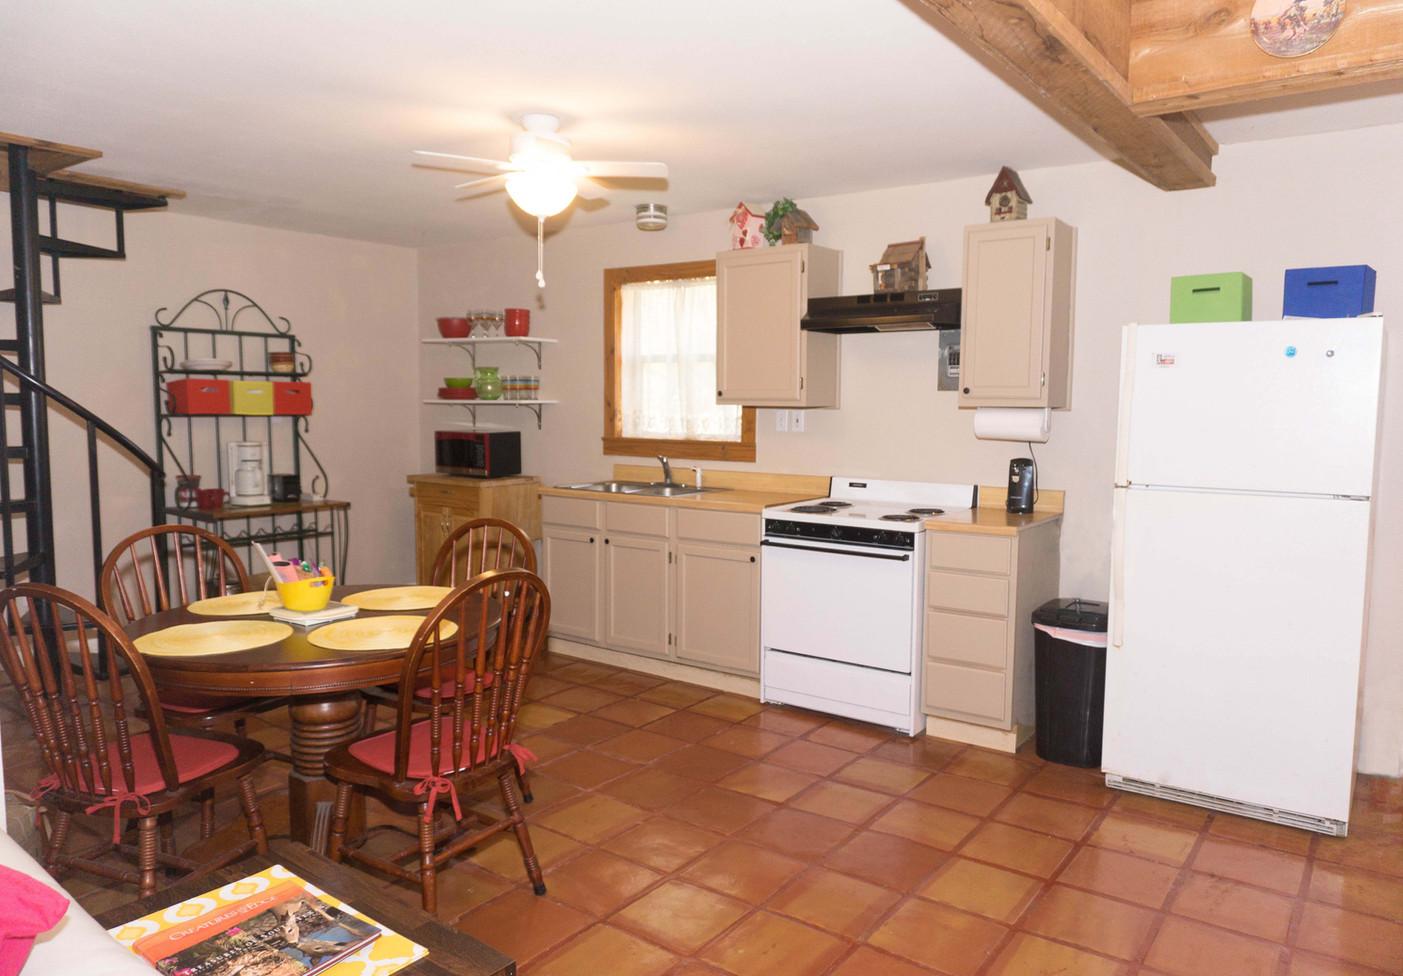 Merritt bunkhouse kitchen.jpg